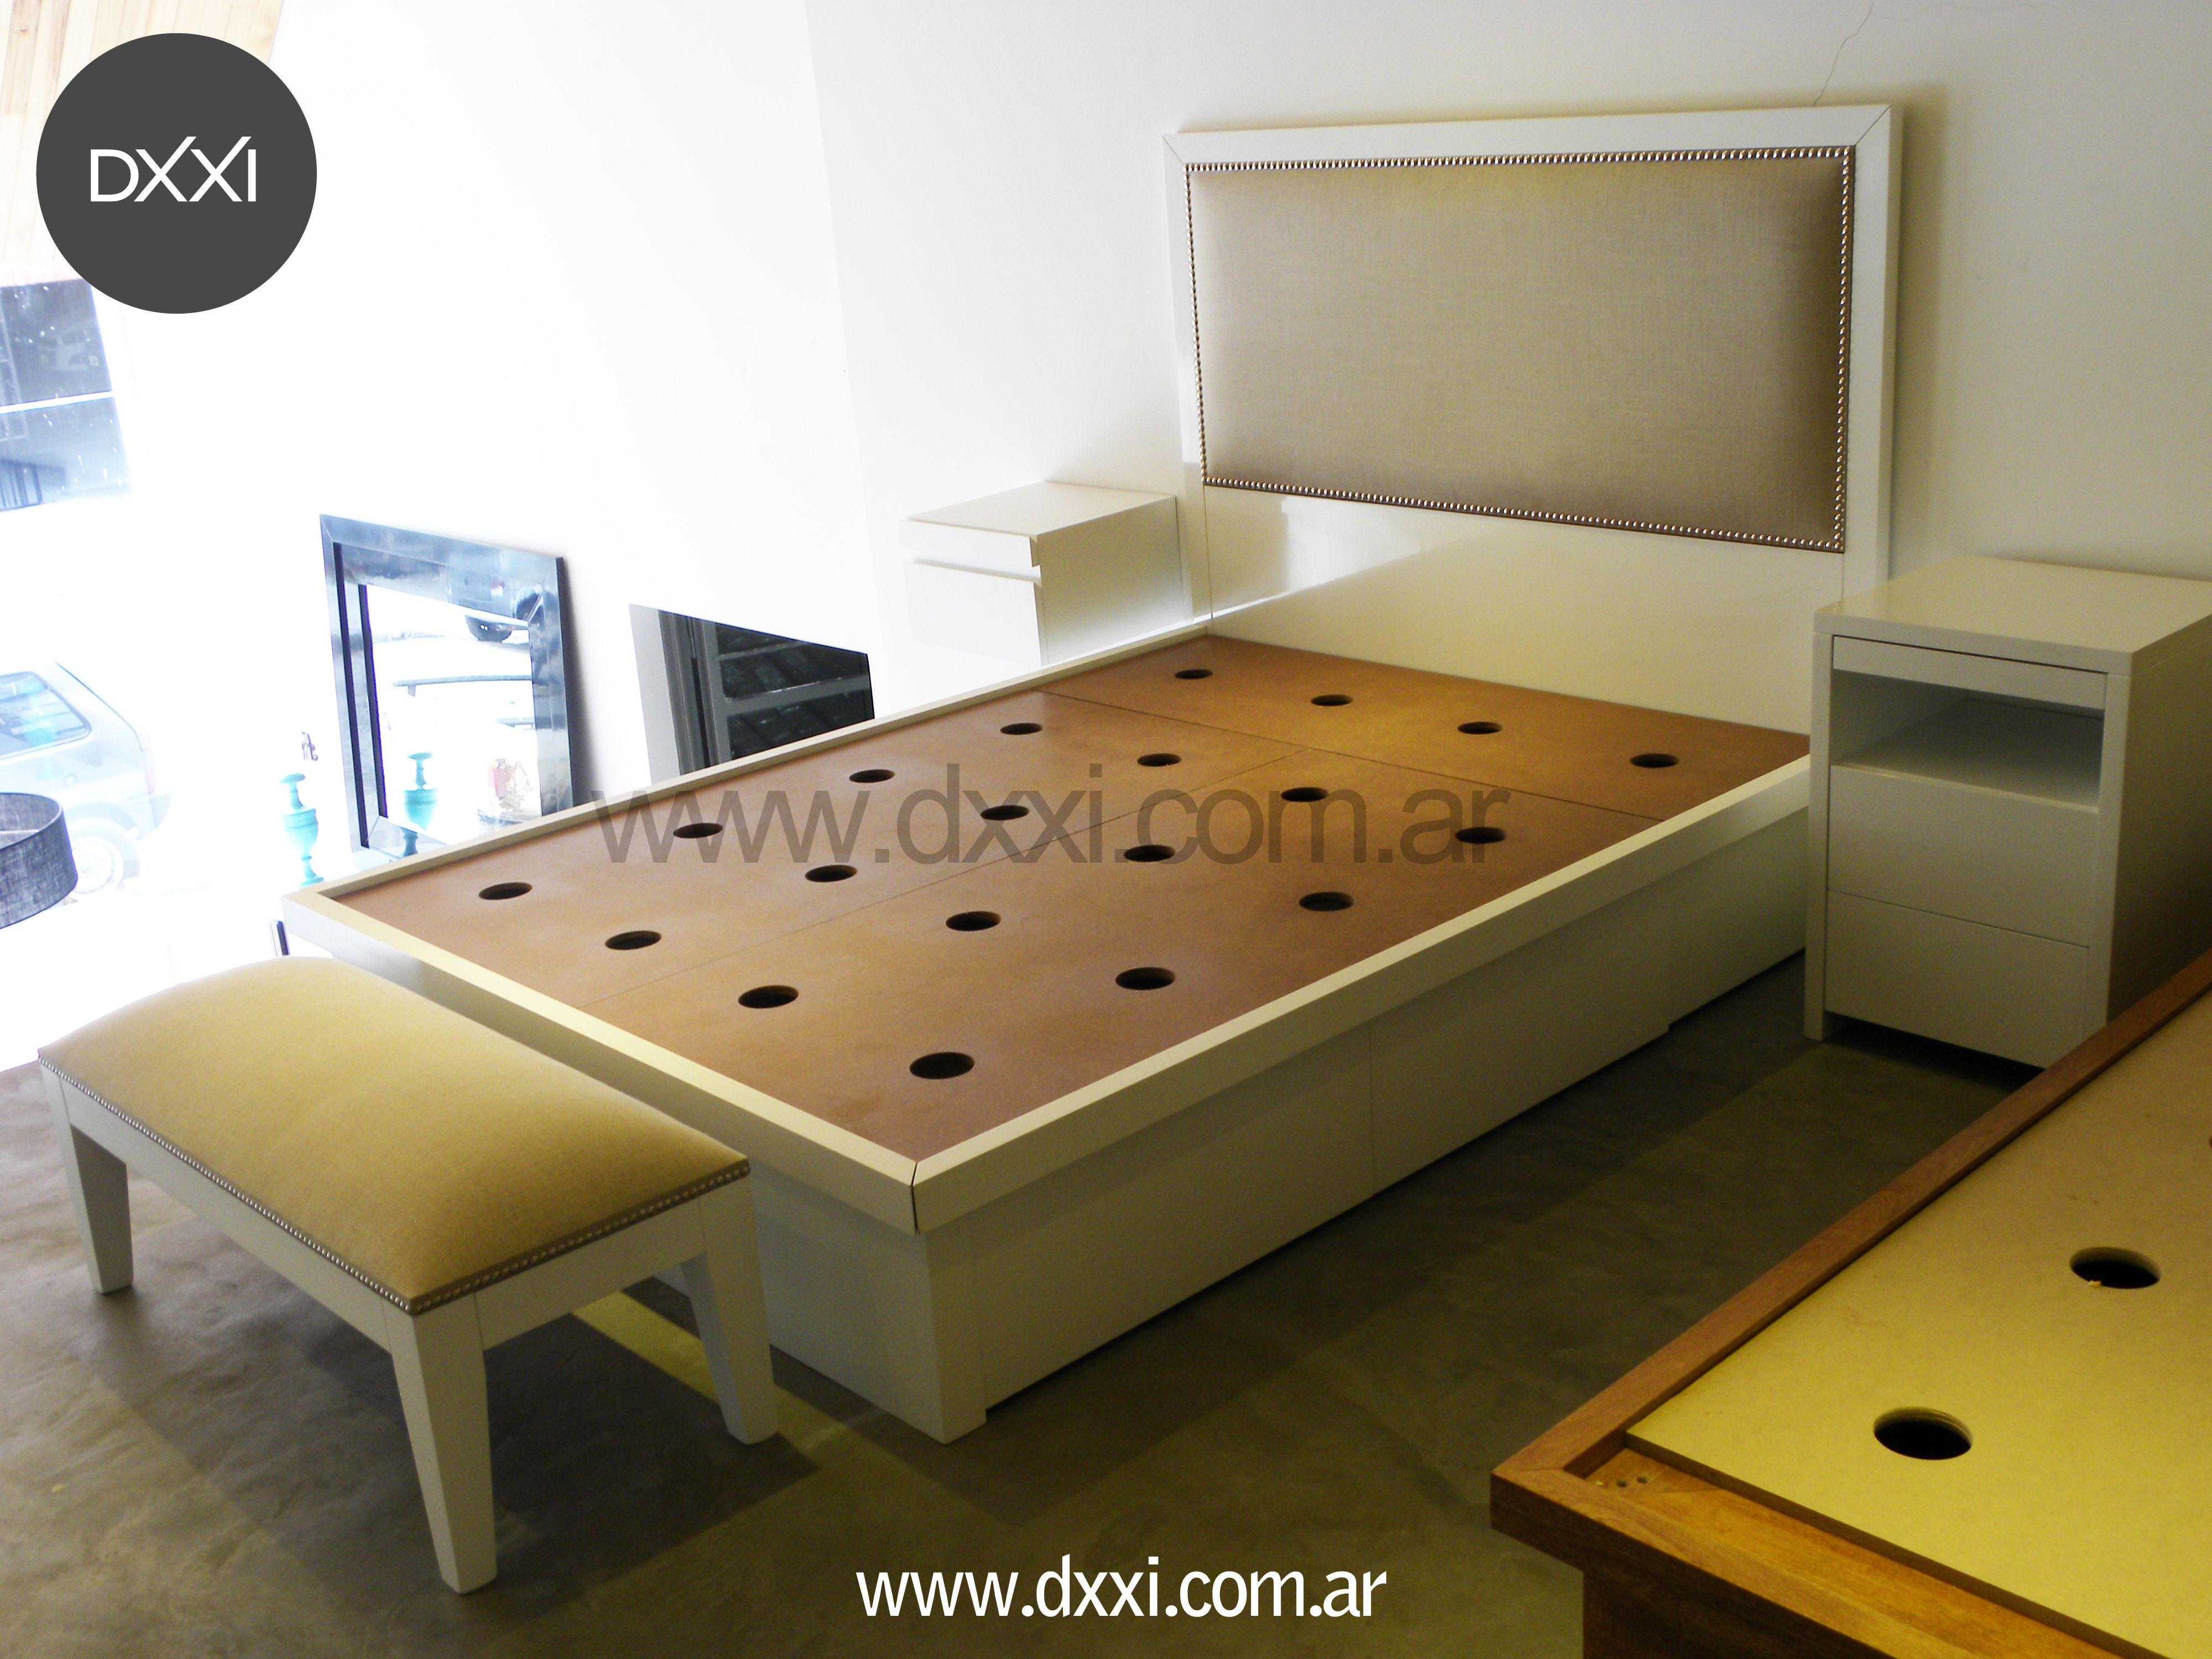 www.dxxi.com.ar #cama #bed #dormitorio #dxxi #furniture #muebles ...